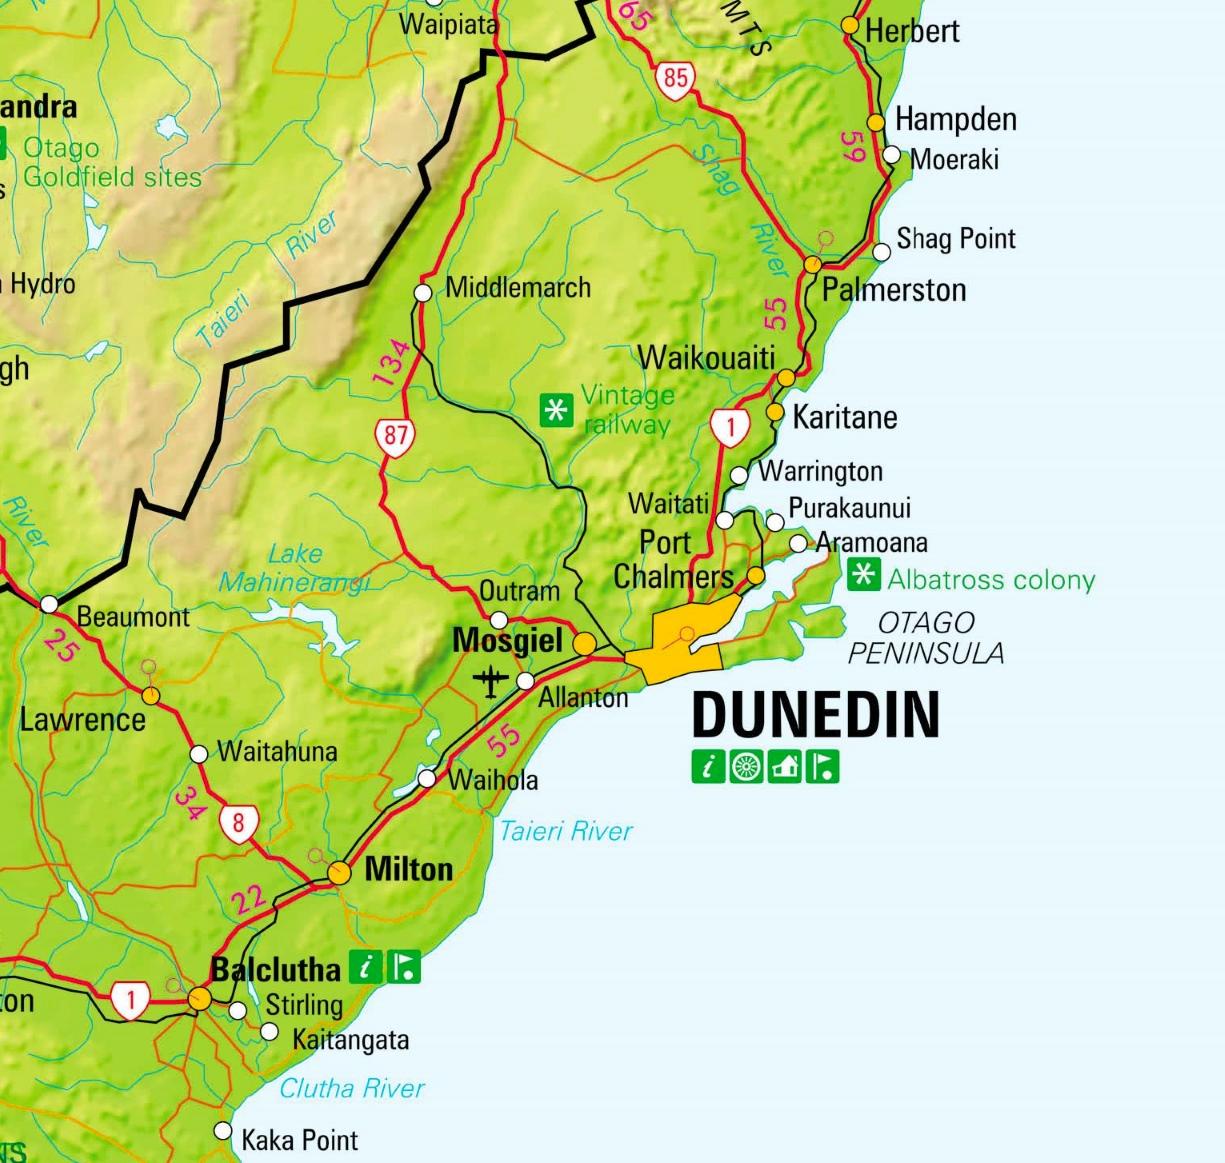 Dunedin Map New Zealand.Dunedin Area Map